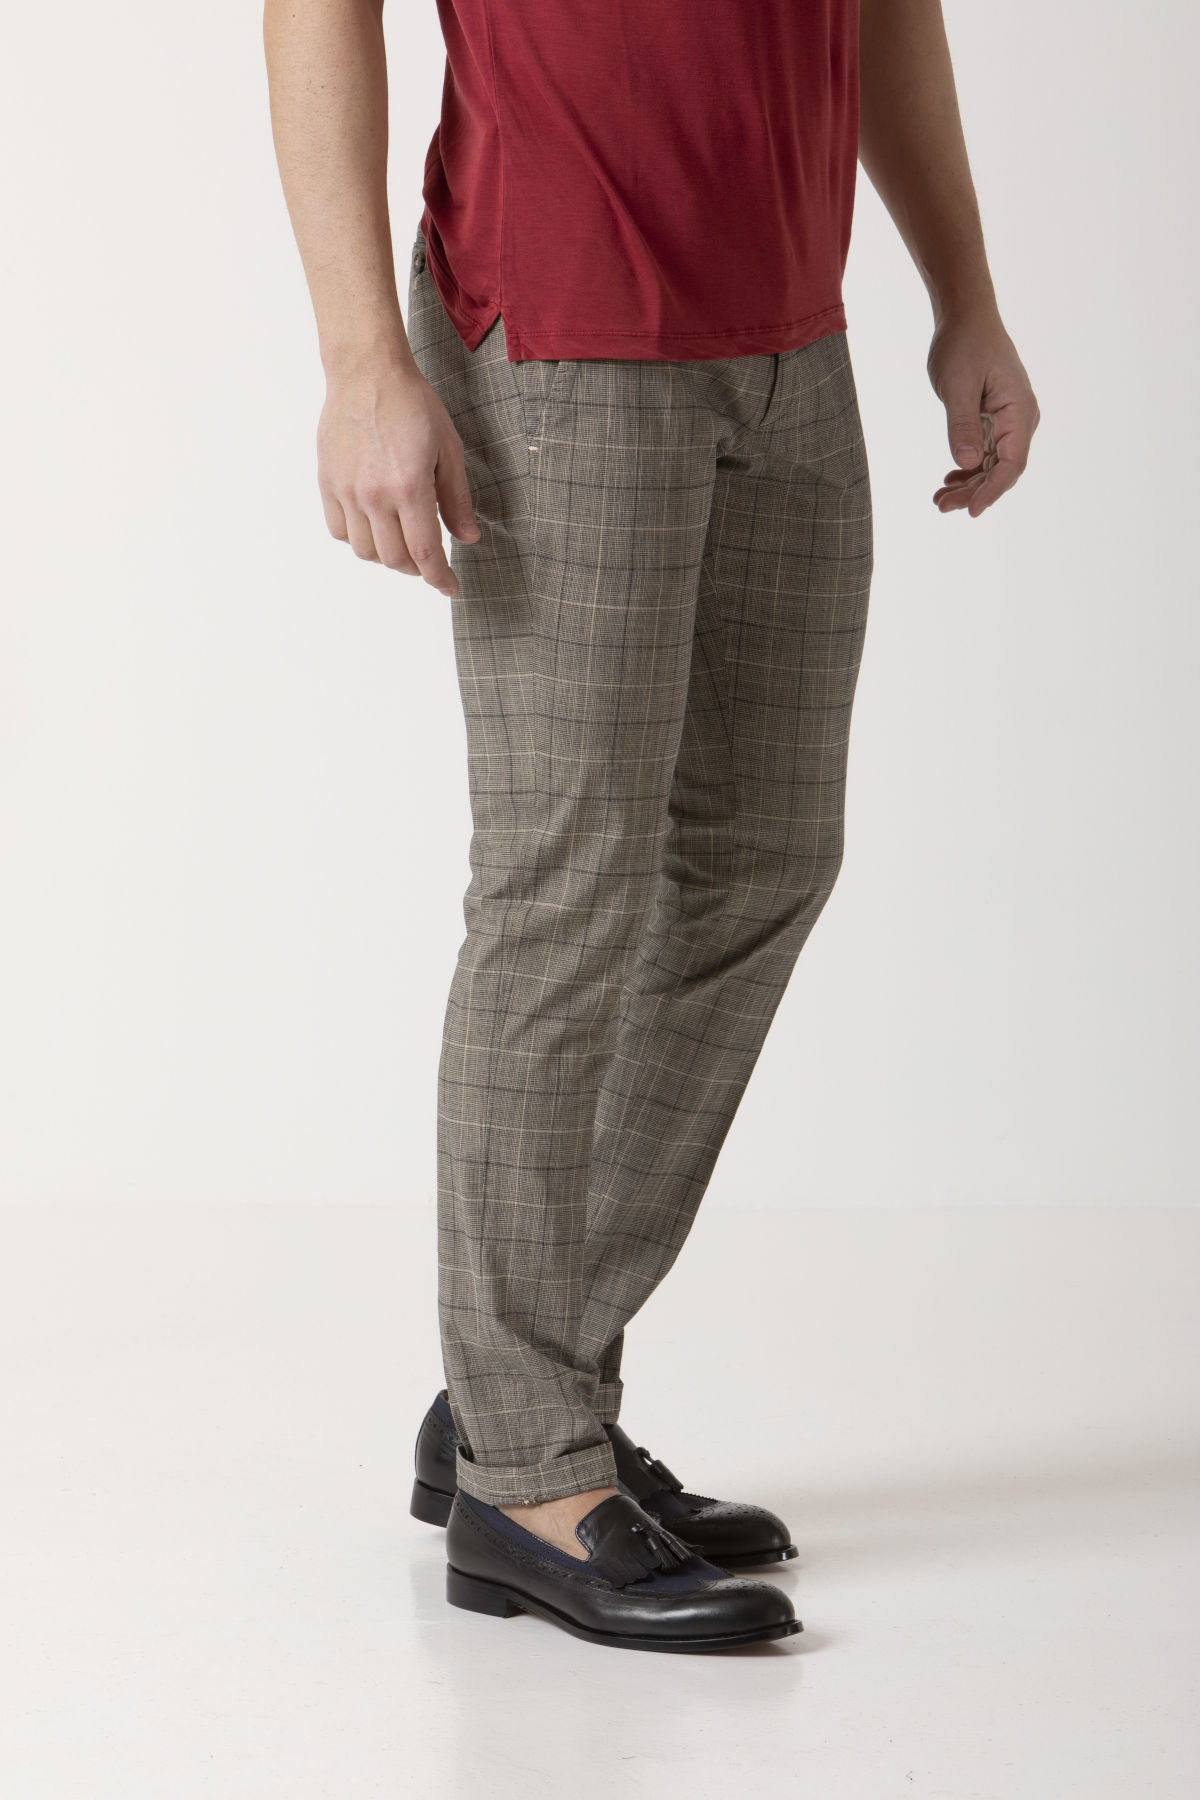 Pantaloni MARLON per uomo MICHAEL COAL PE 19